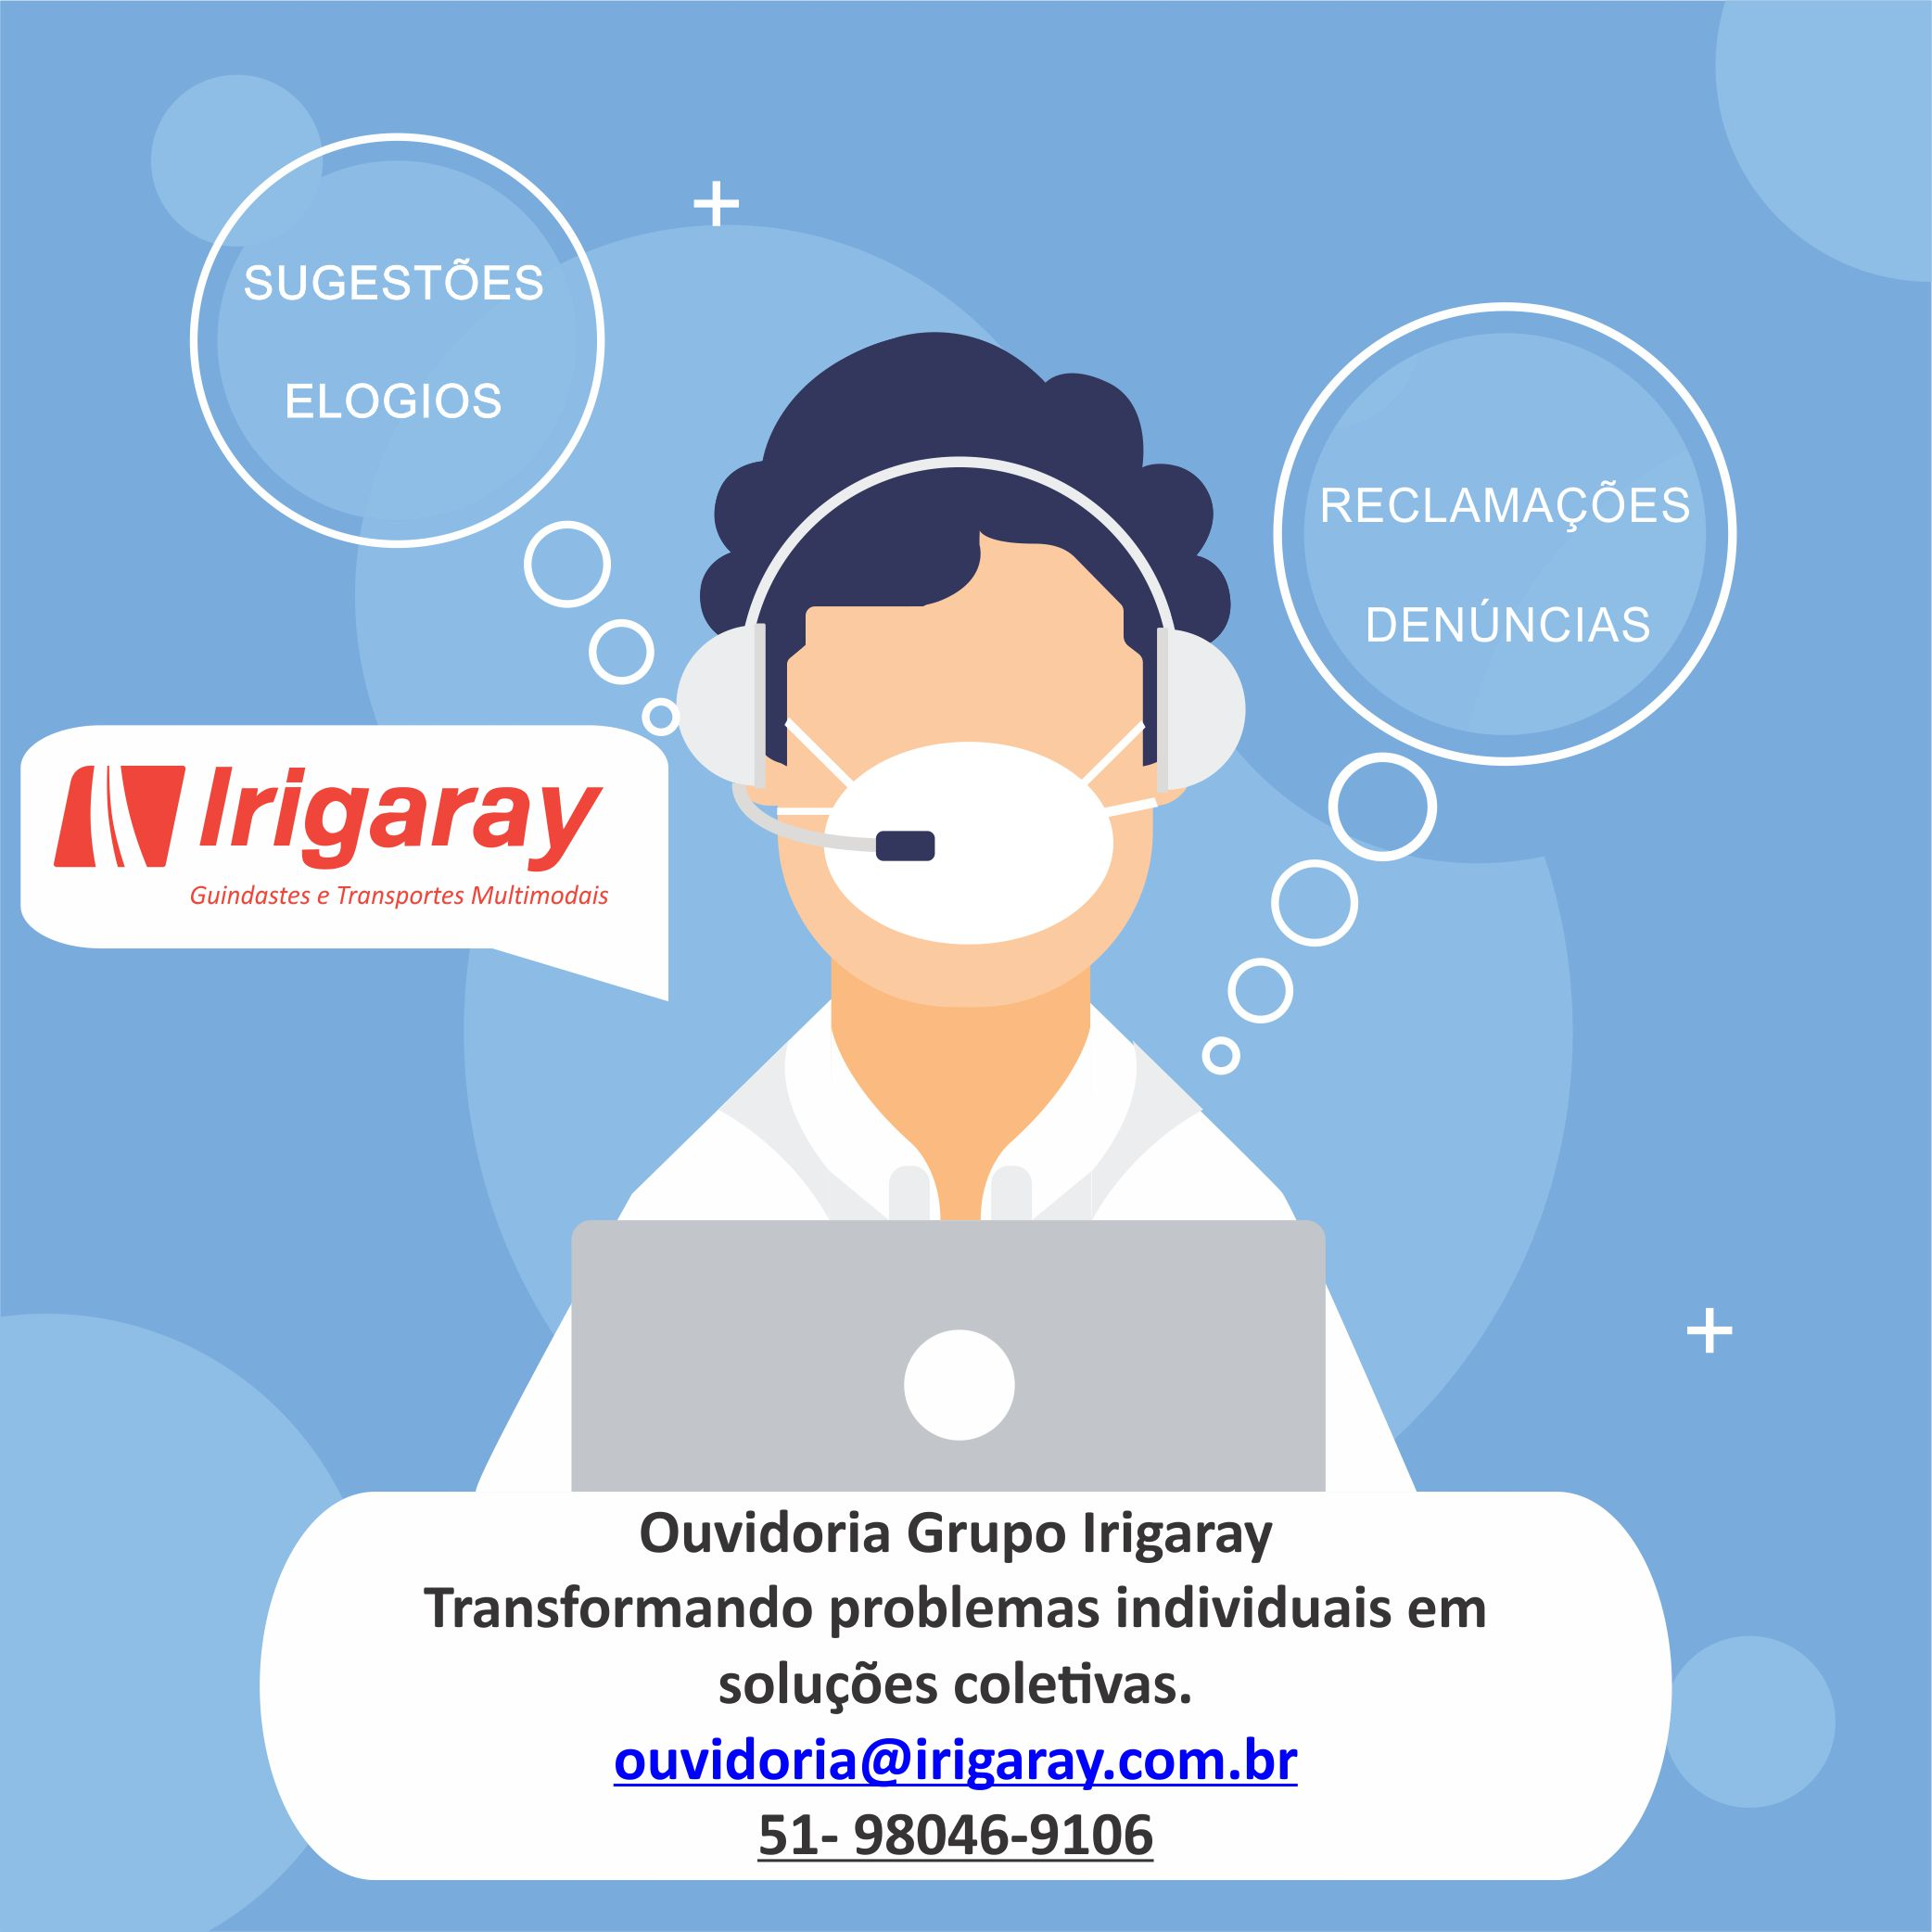 Ouvidoria - Grupo Irigaray